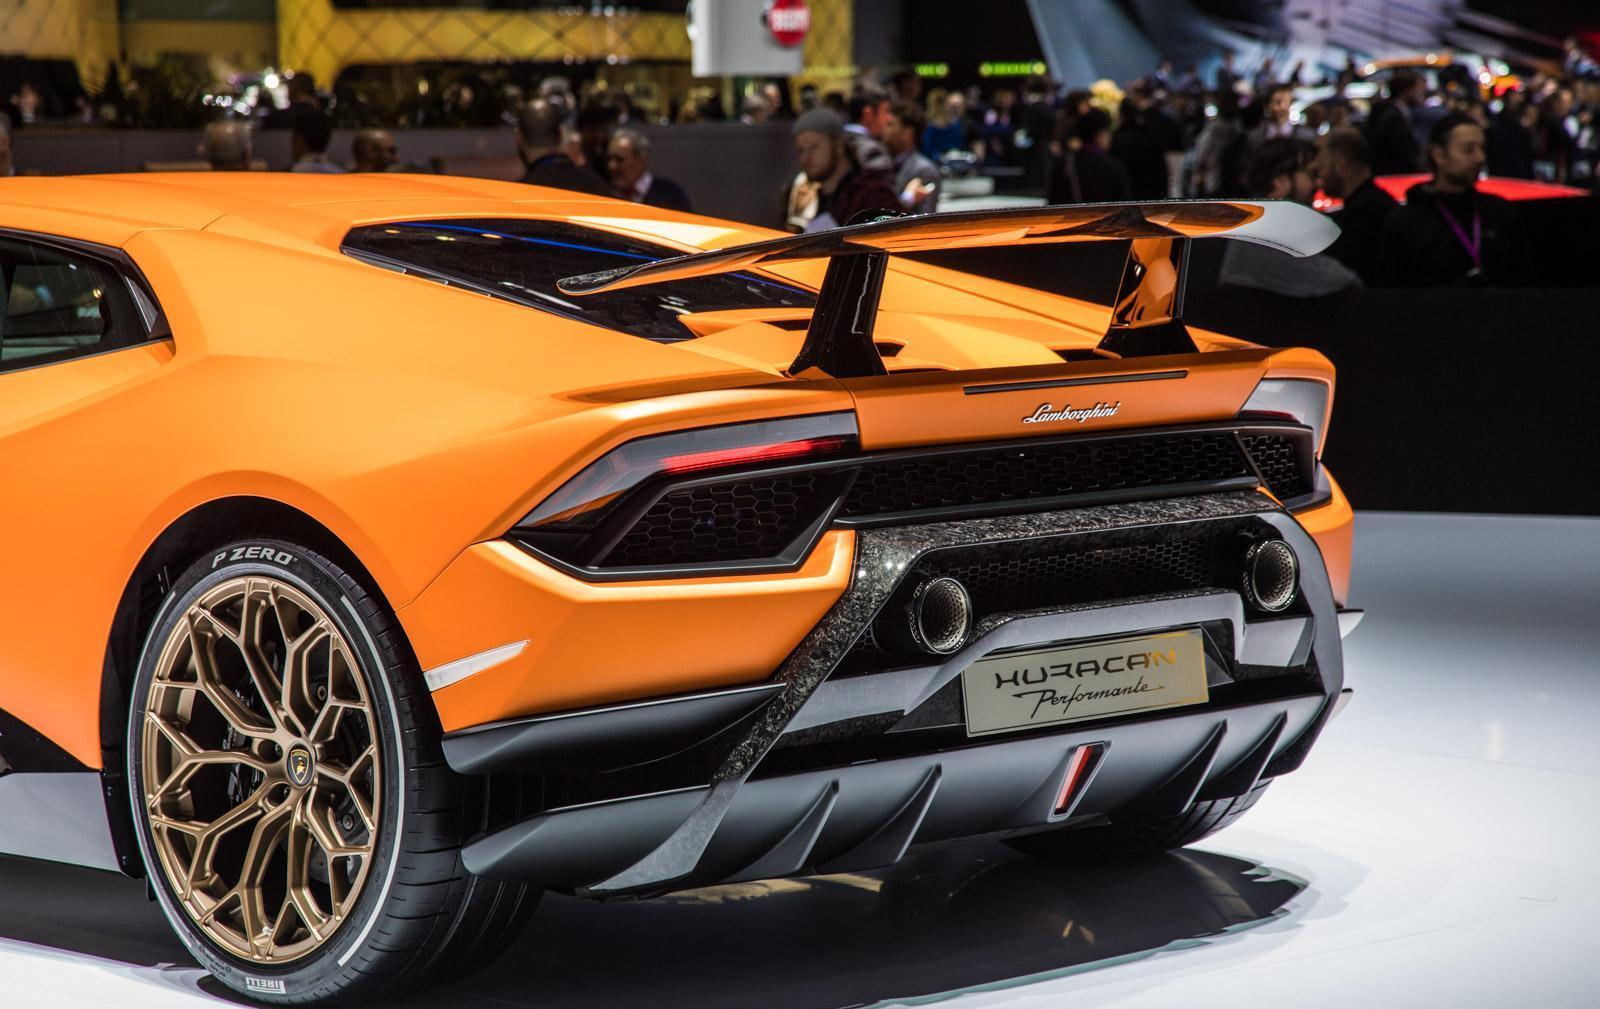 Lamborghini-Huracan-Performante-009